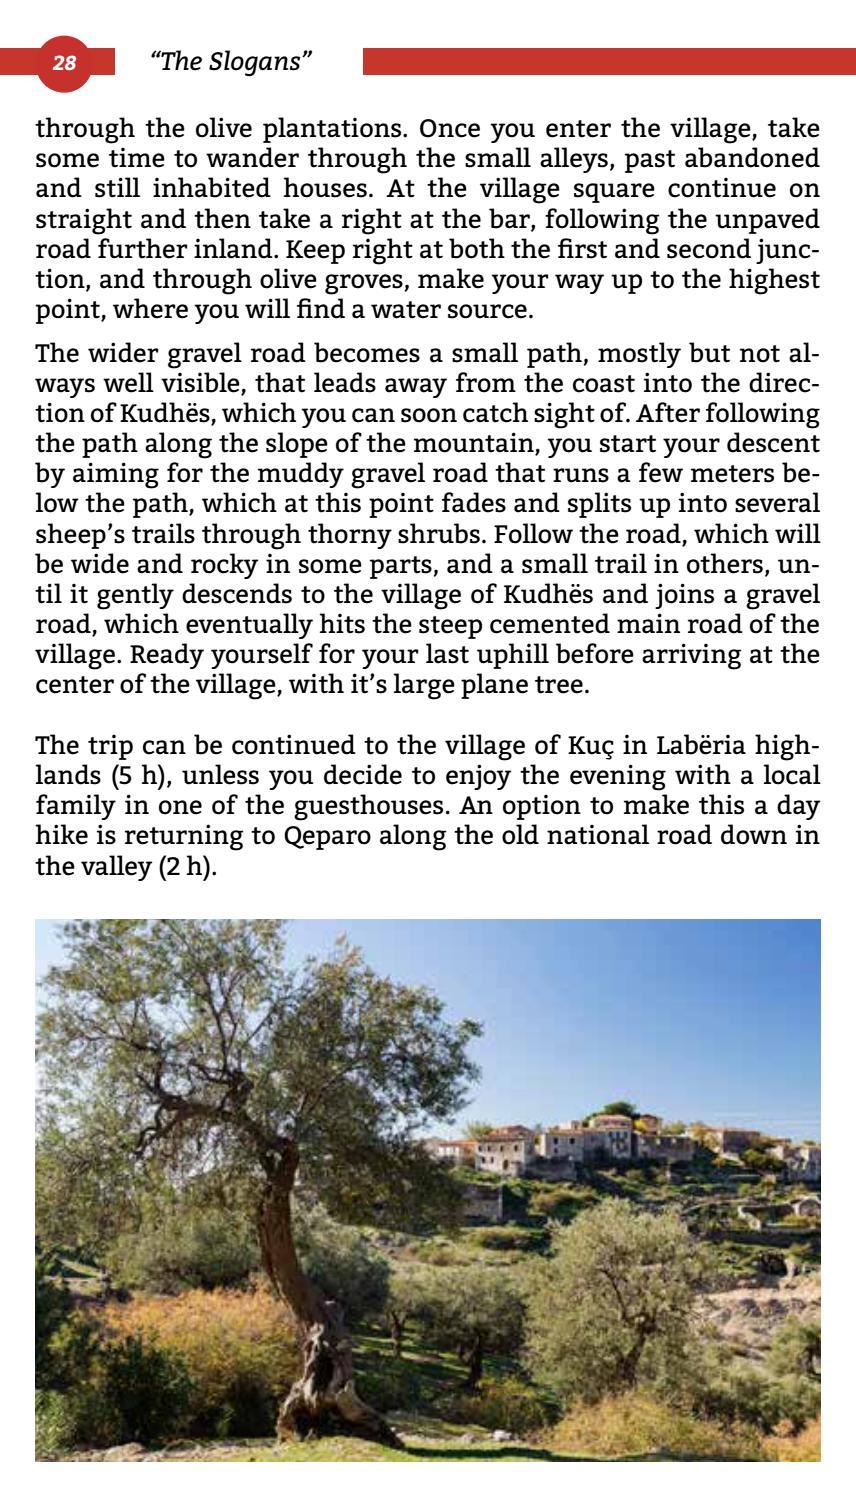 Hiking Trails in Himara Region page 28